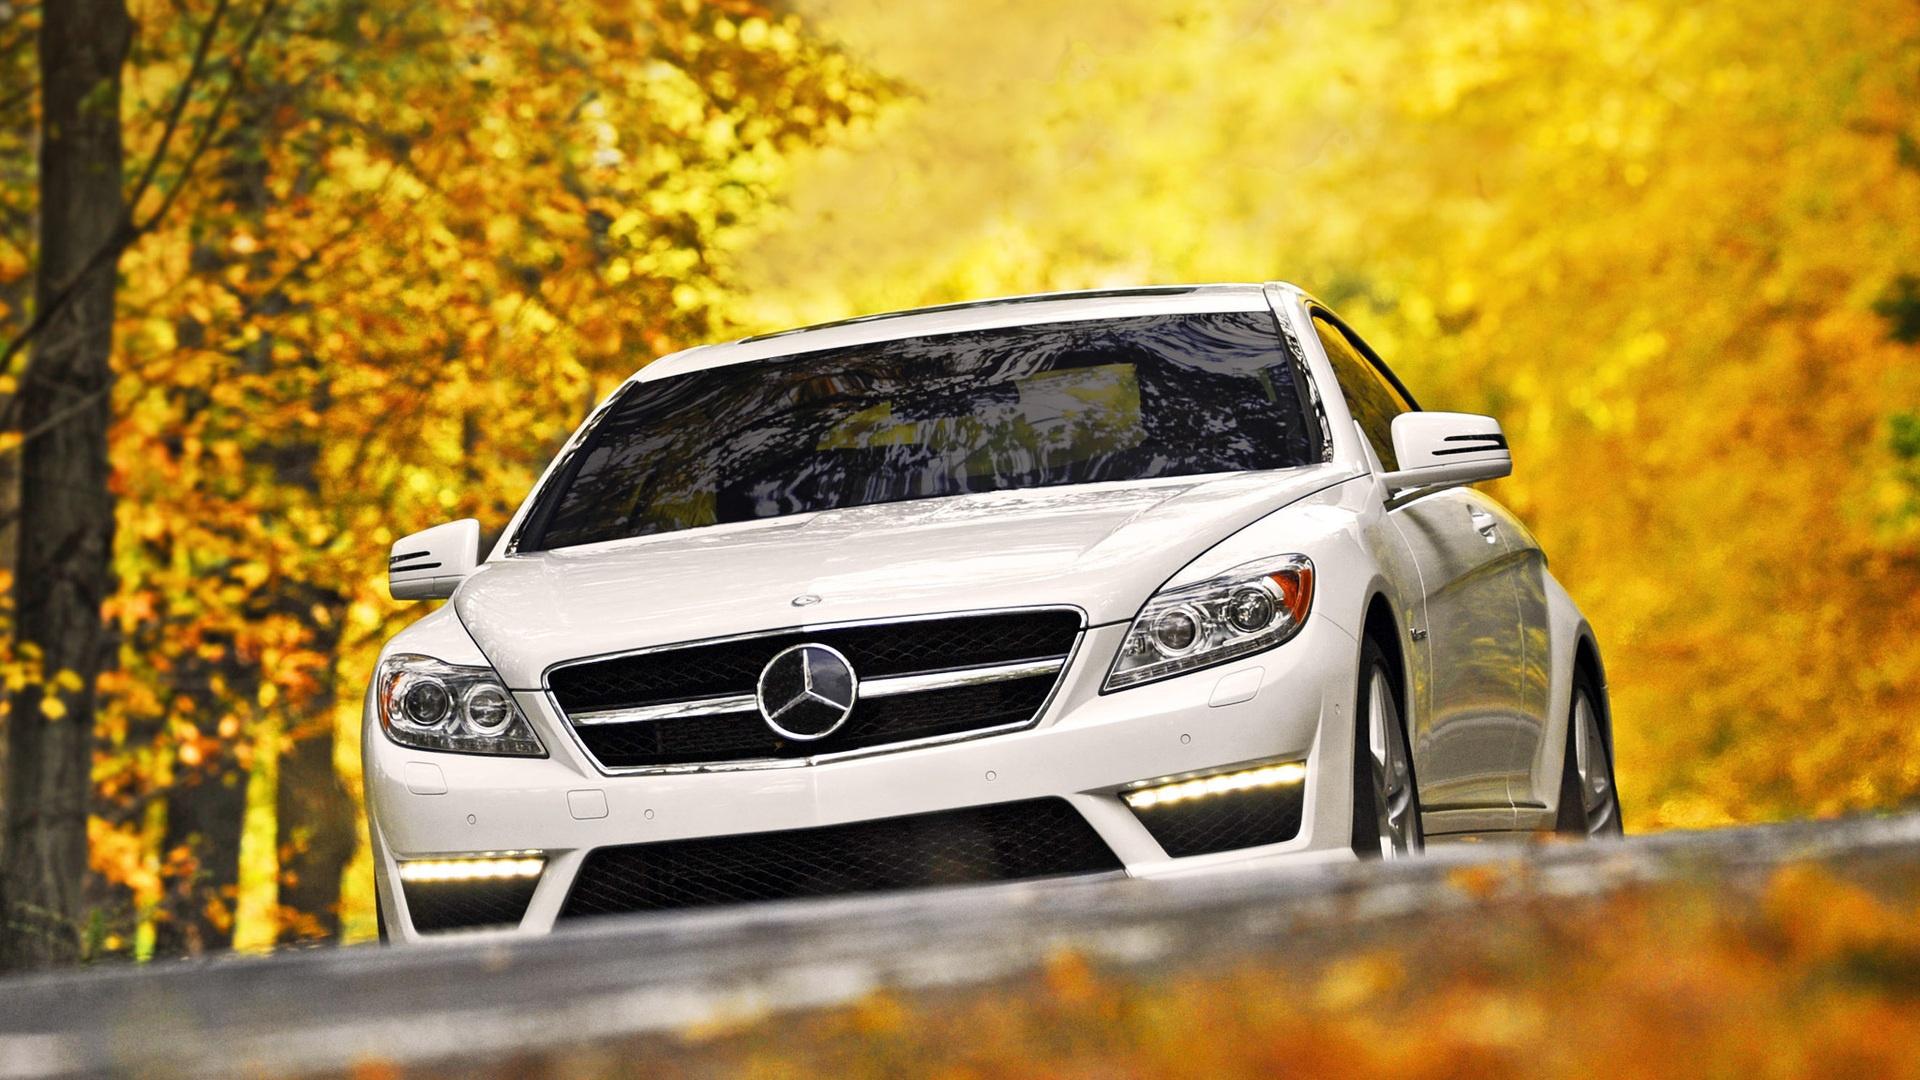 2012 Mercedes Benz CL63 AMG Wallpapers   1920x1080   661154 1920x1080